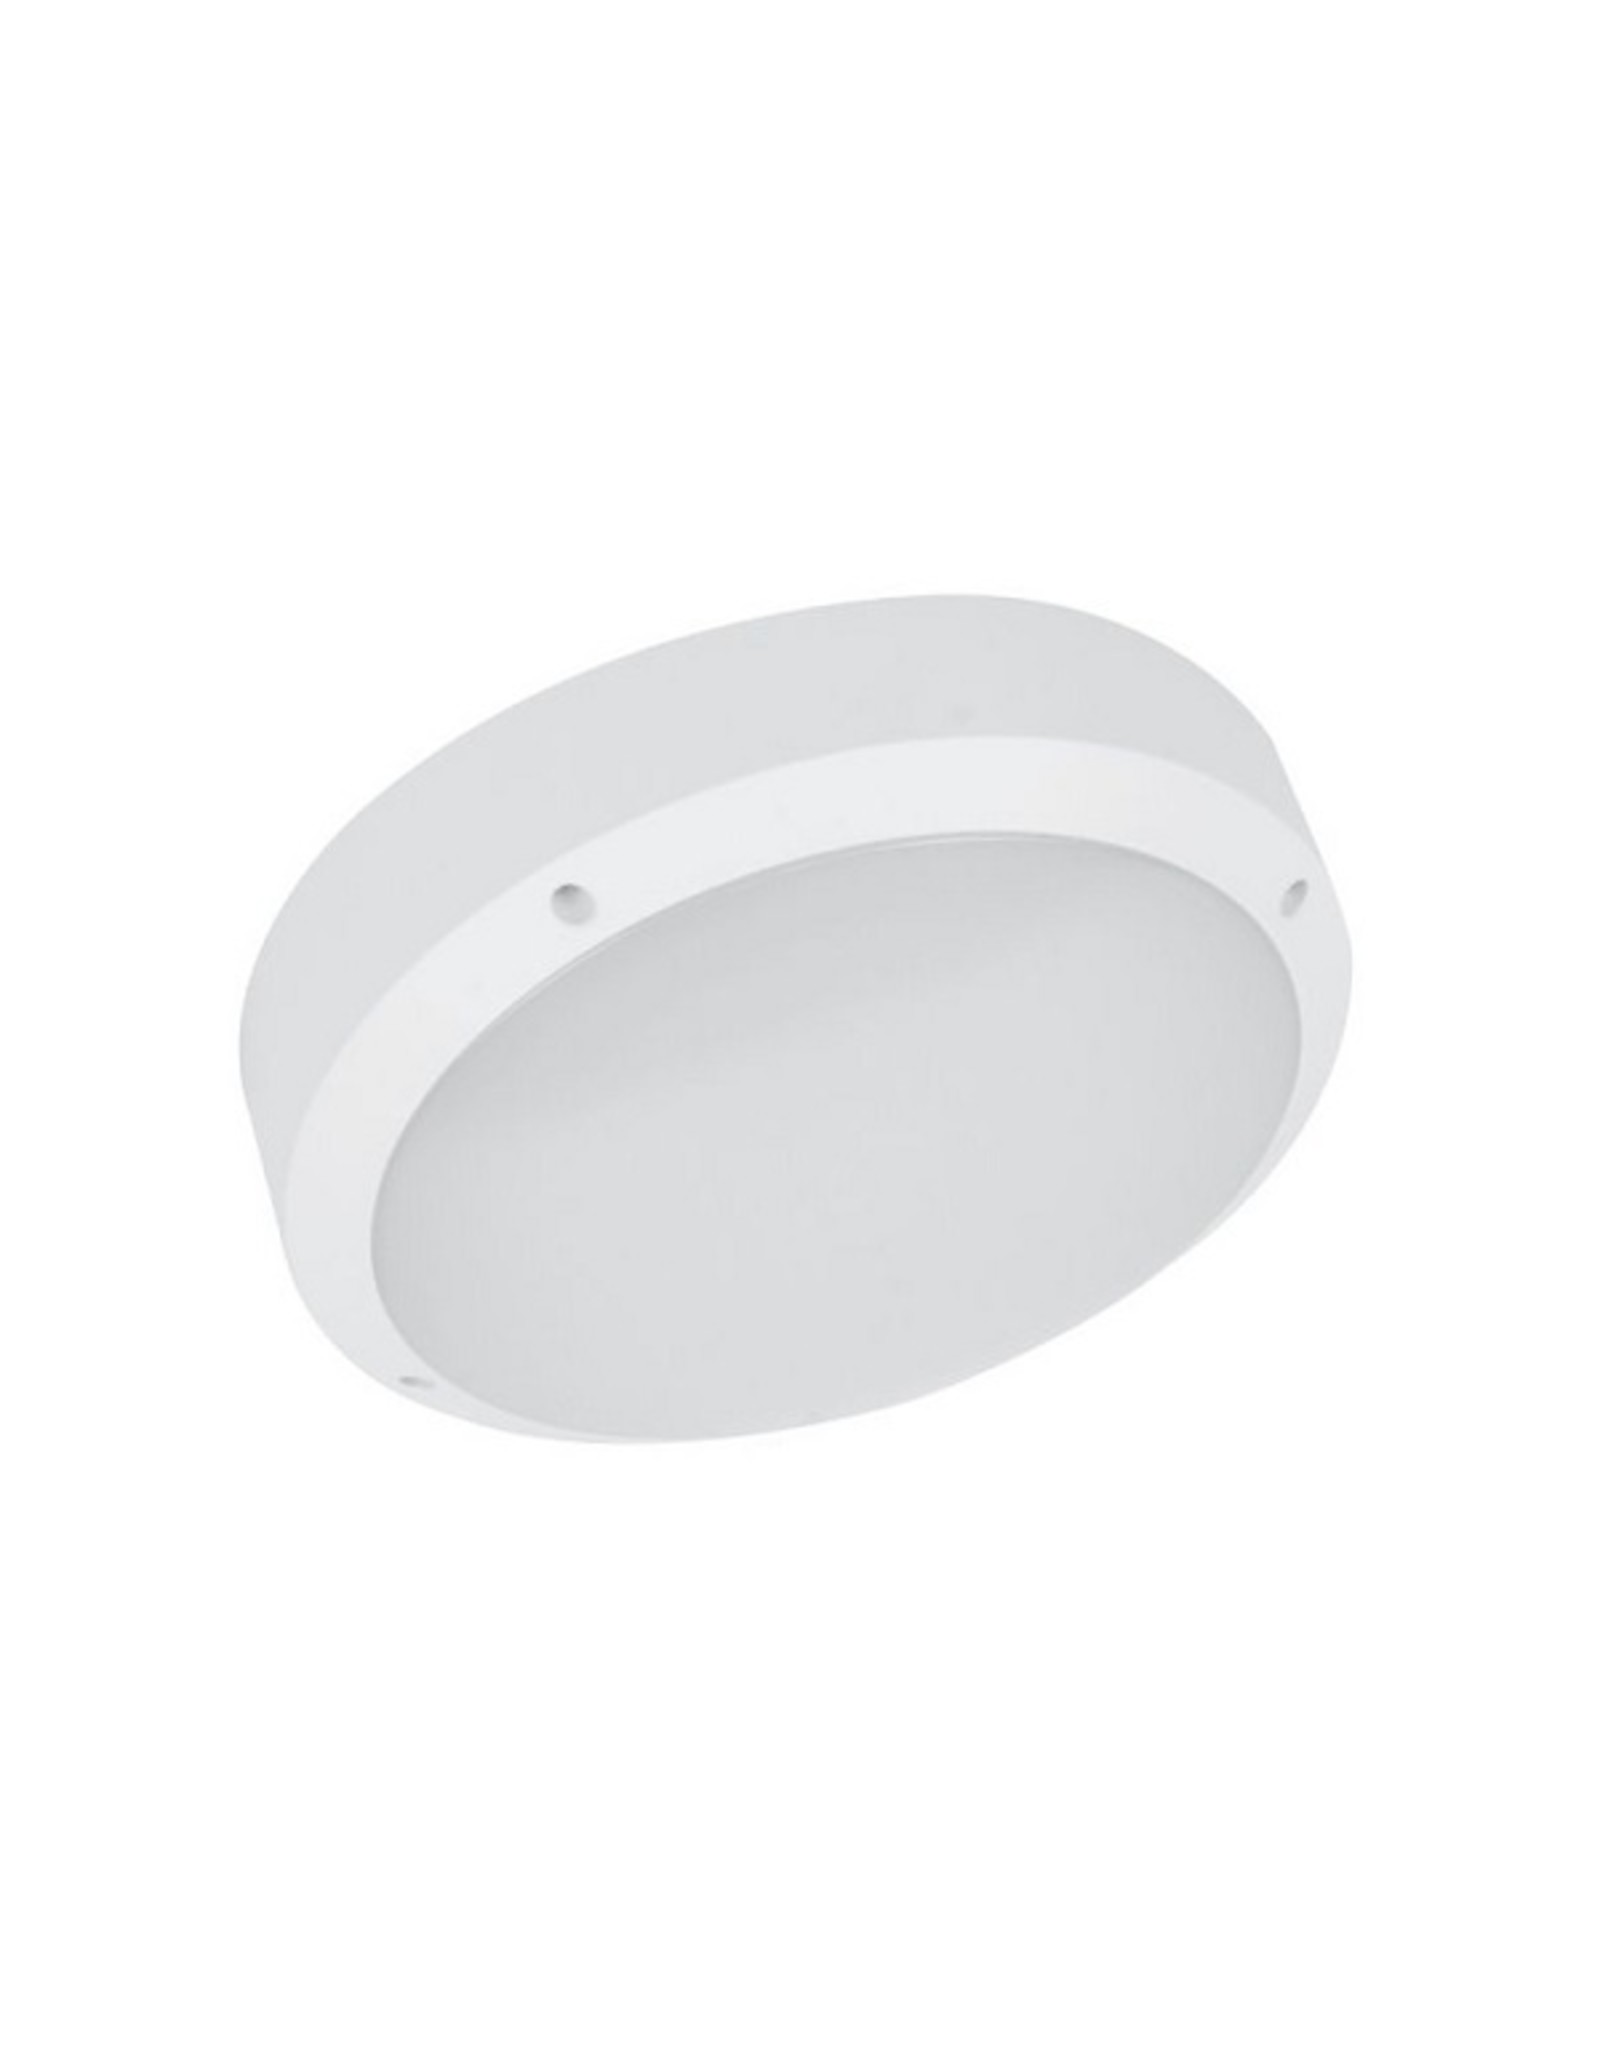 LedLed LED Plafonniere IK10 ROLO 12W 4000k